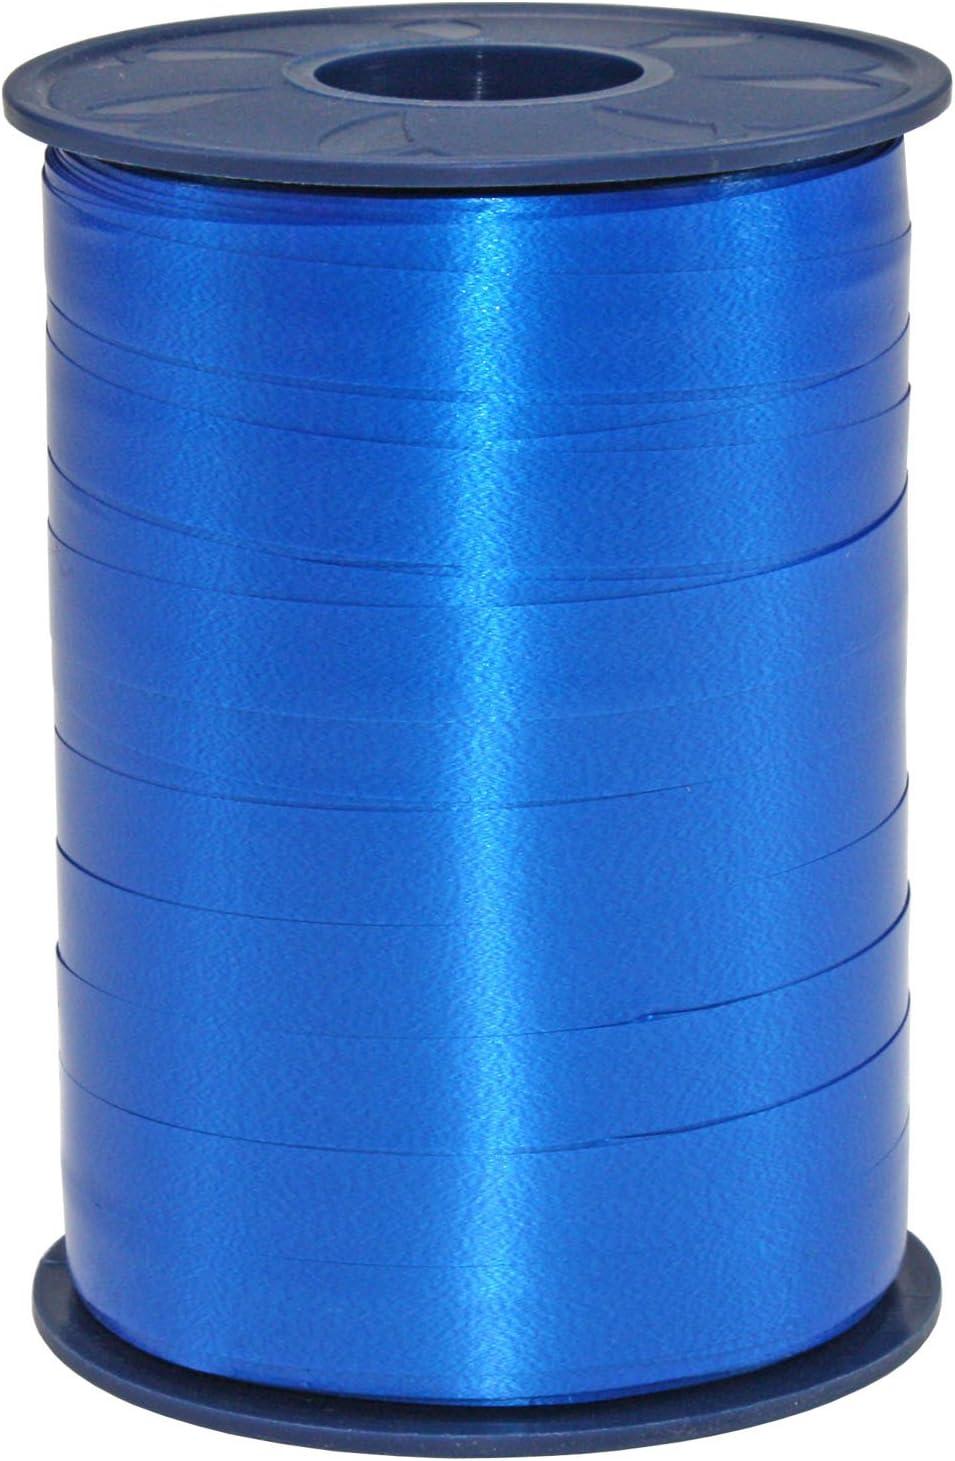 Pr/äsent C.E Pattberg Ruban 10 mm 250 m Ruban /à friser Fleurs Bleu